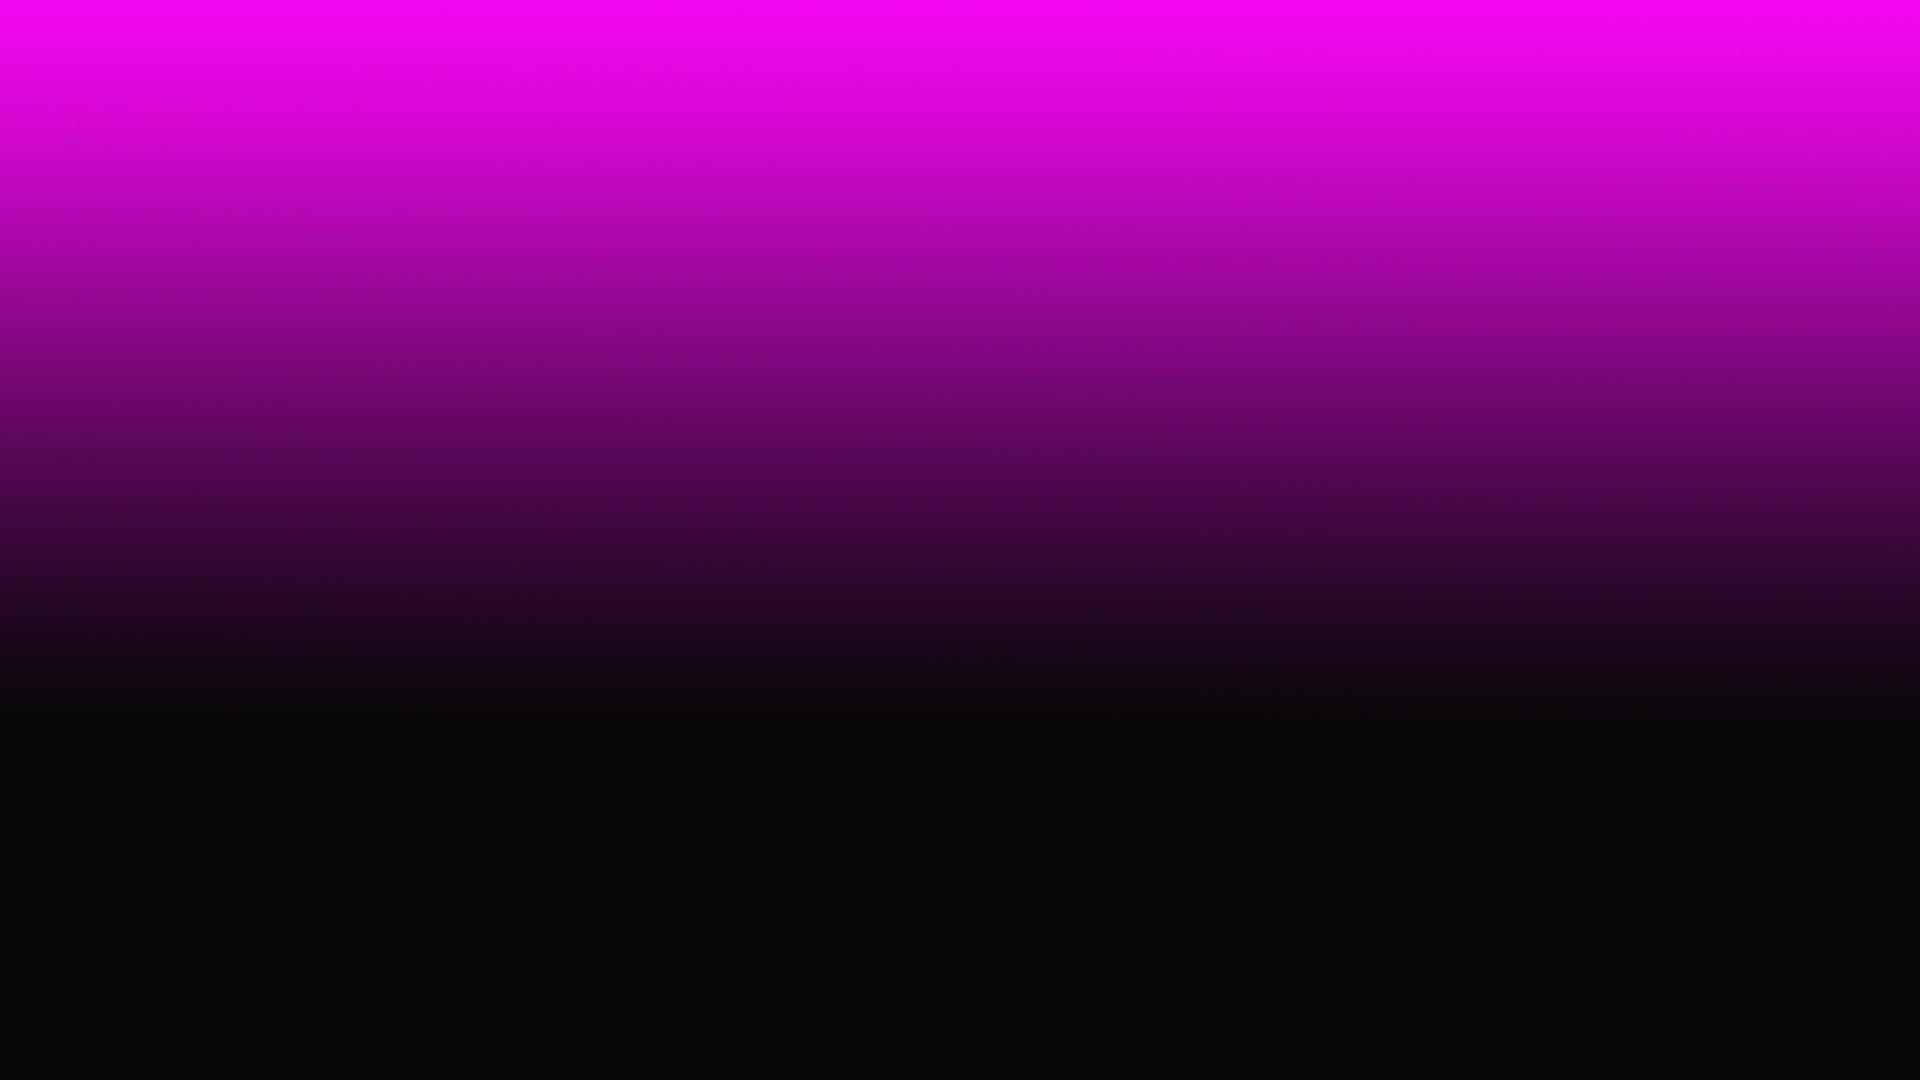 Black To Pink Gradient wallpaper – 865927